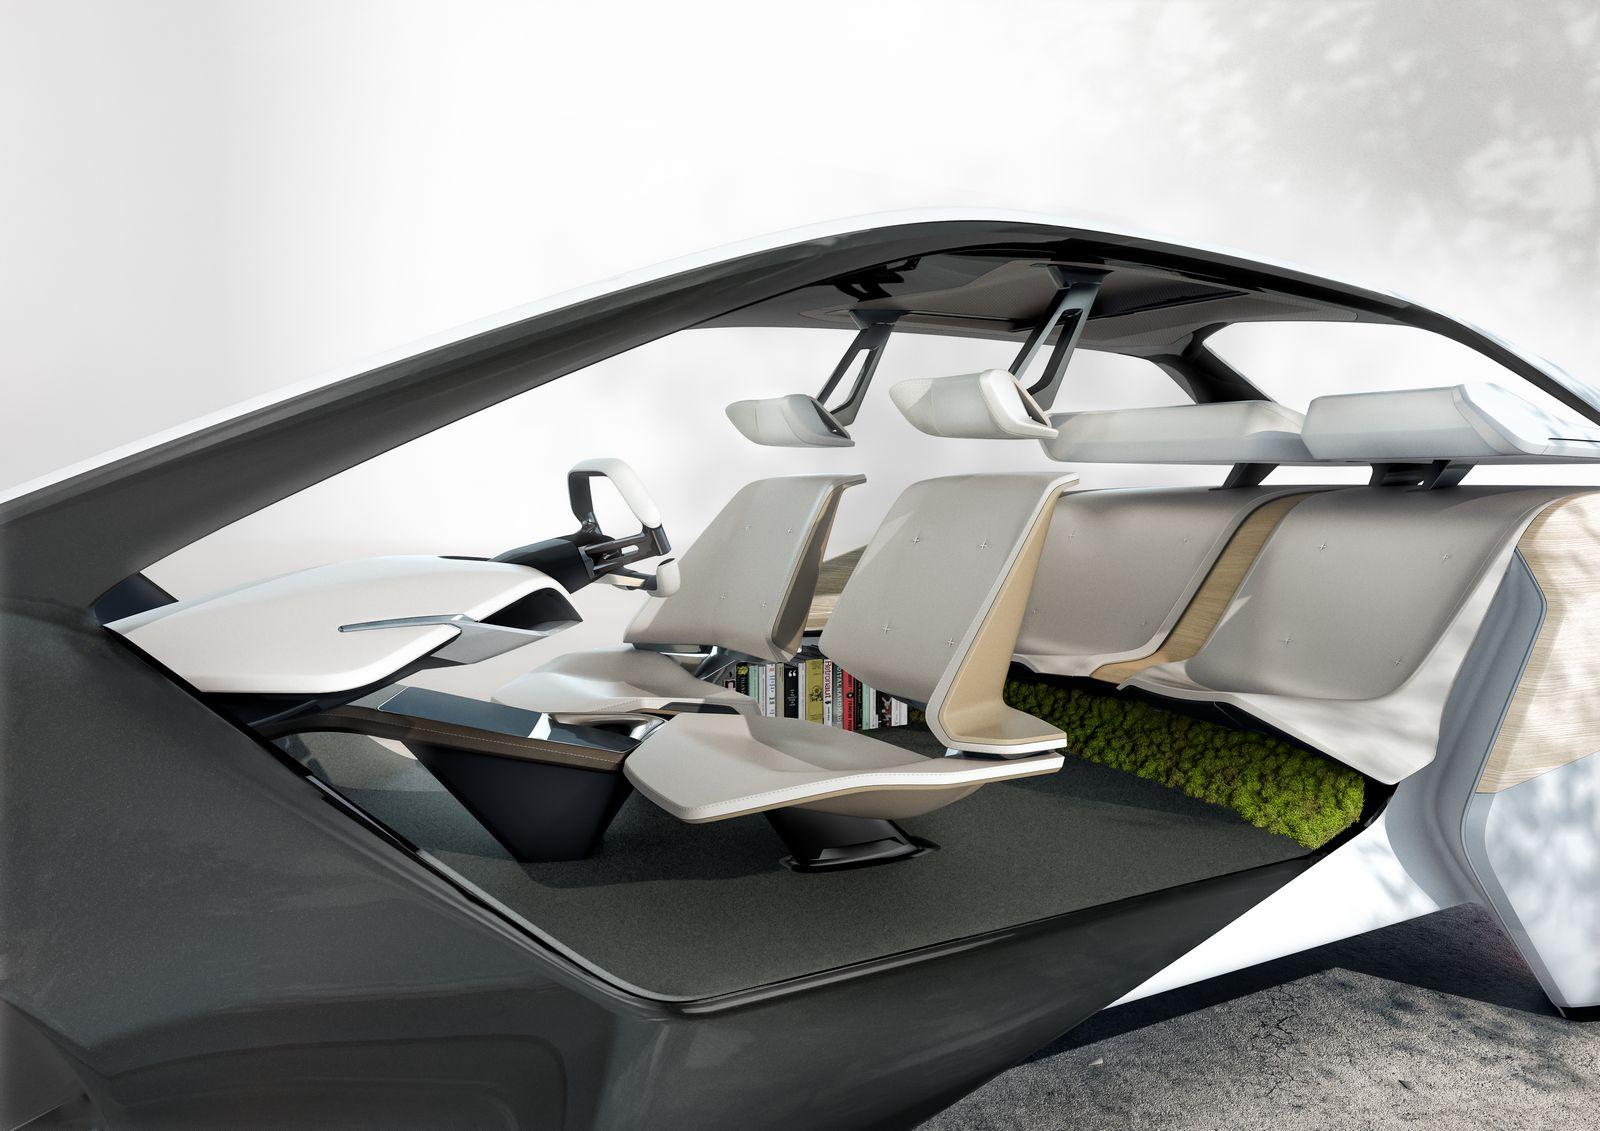 2017 bmw i inside future autokonzepte. Black Bedroom Furniture Sets. Home Design Ideas